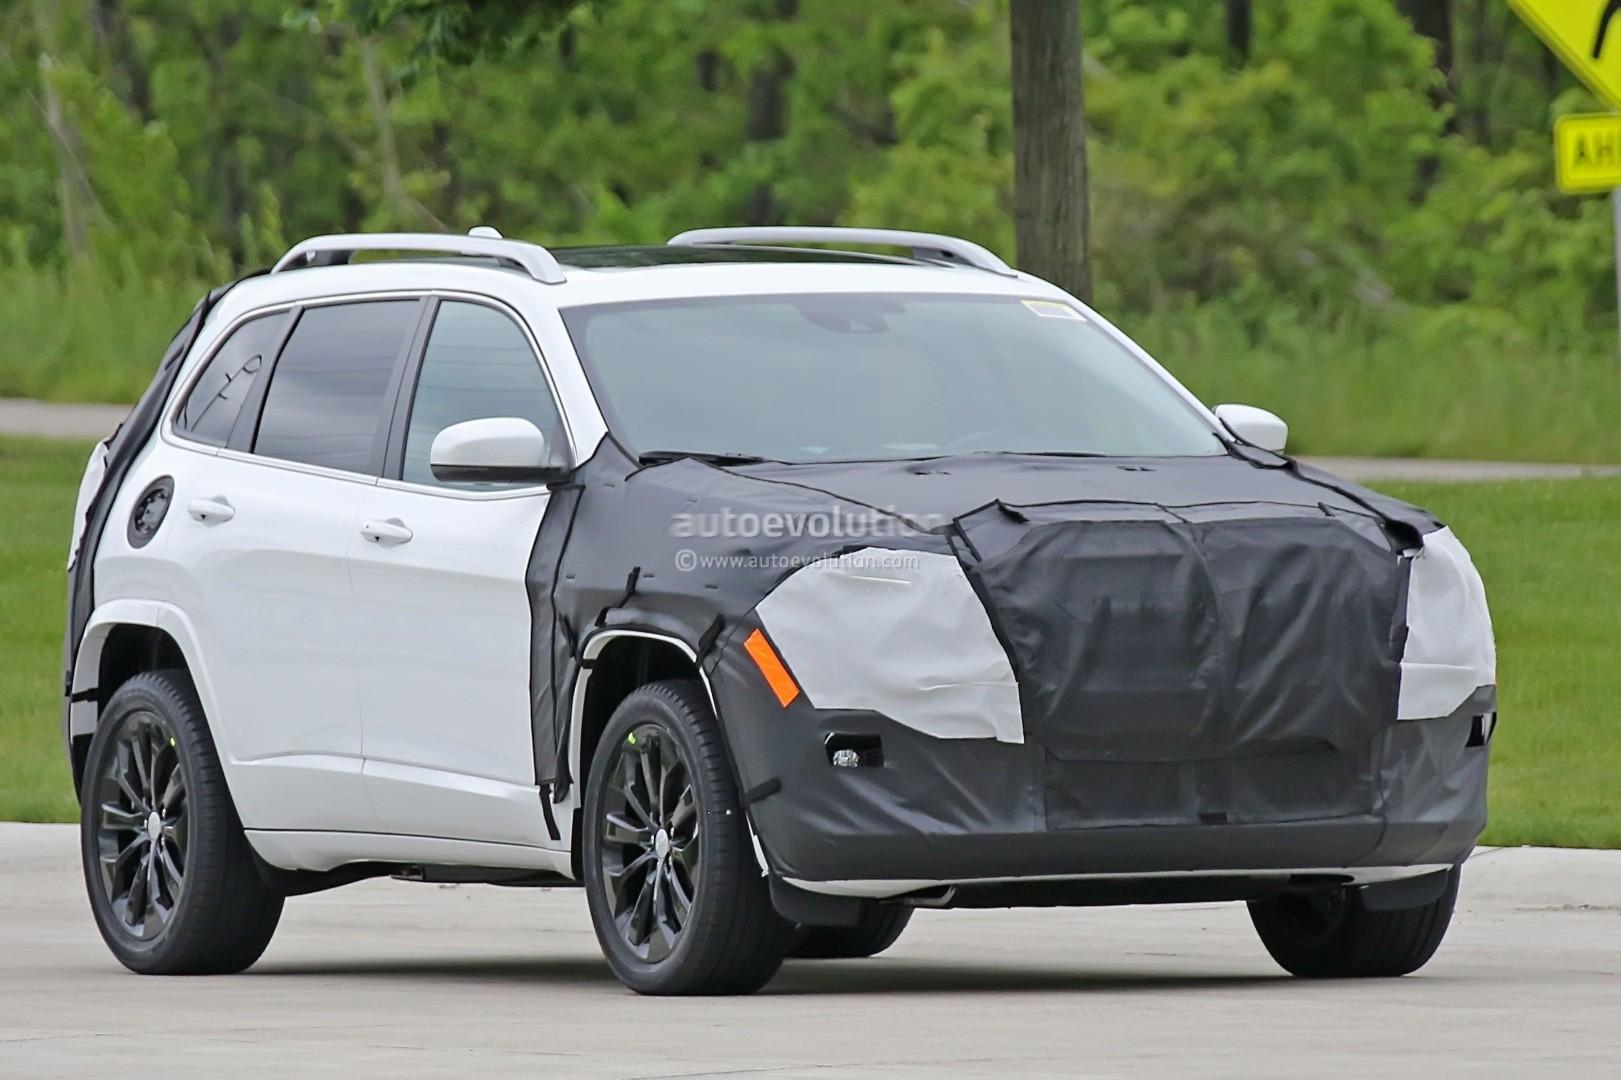 2018 jeep cherokee prototype hints at single-unit headlights